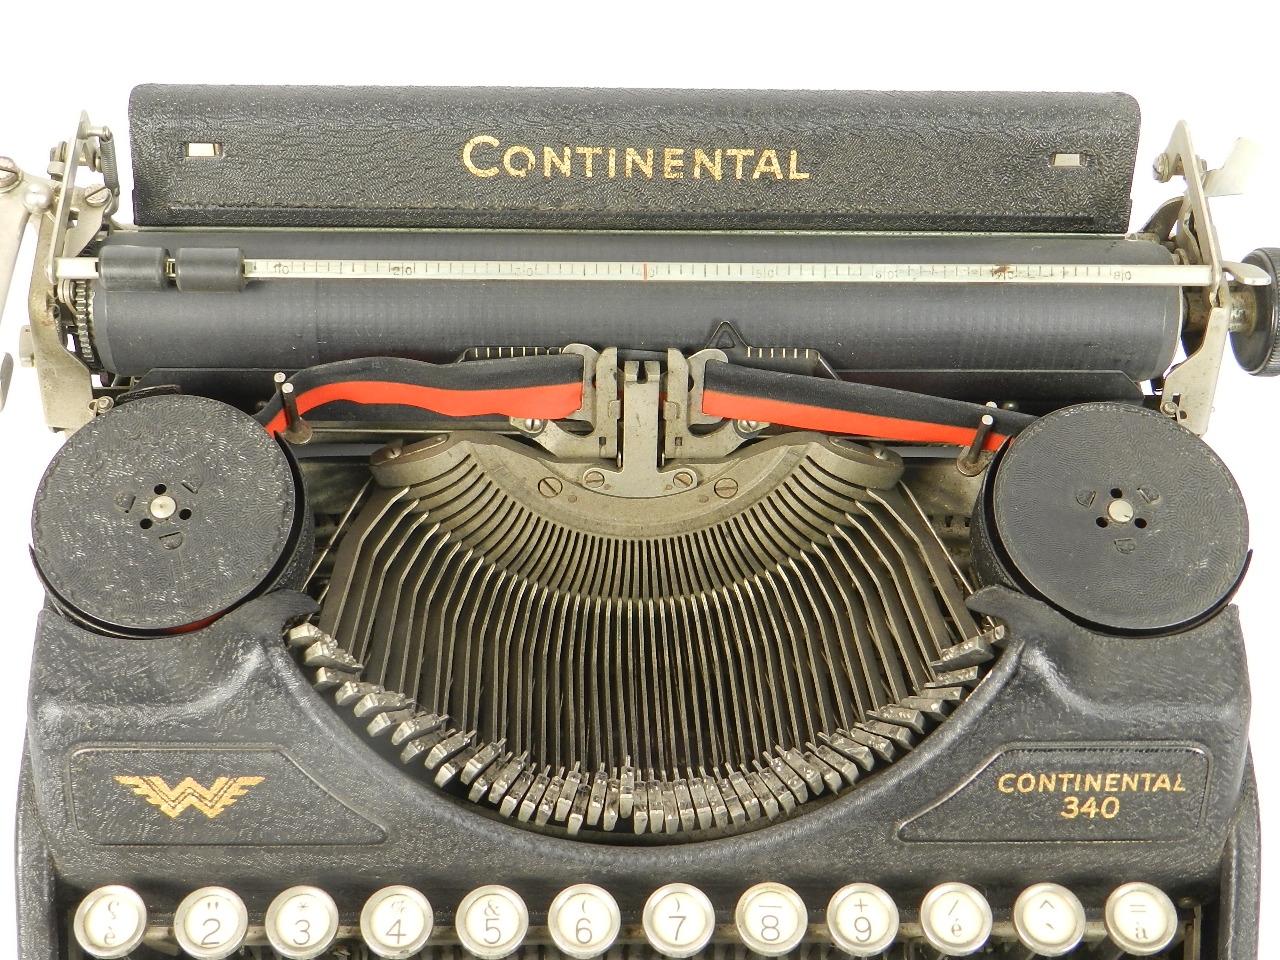 Imagen CONTINENTAL WANDERER 340 AÑO 1935 31088